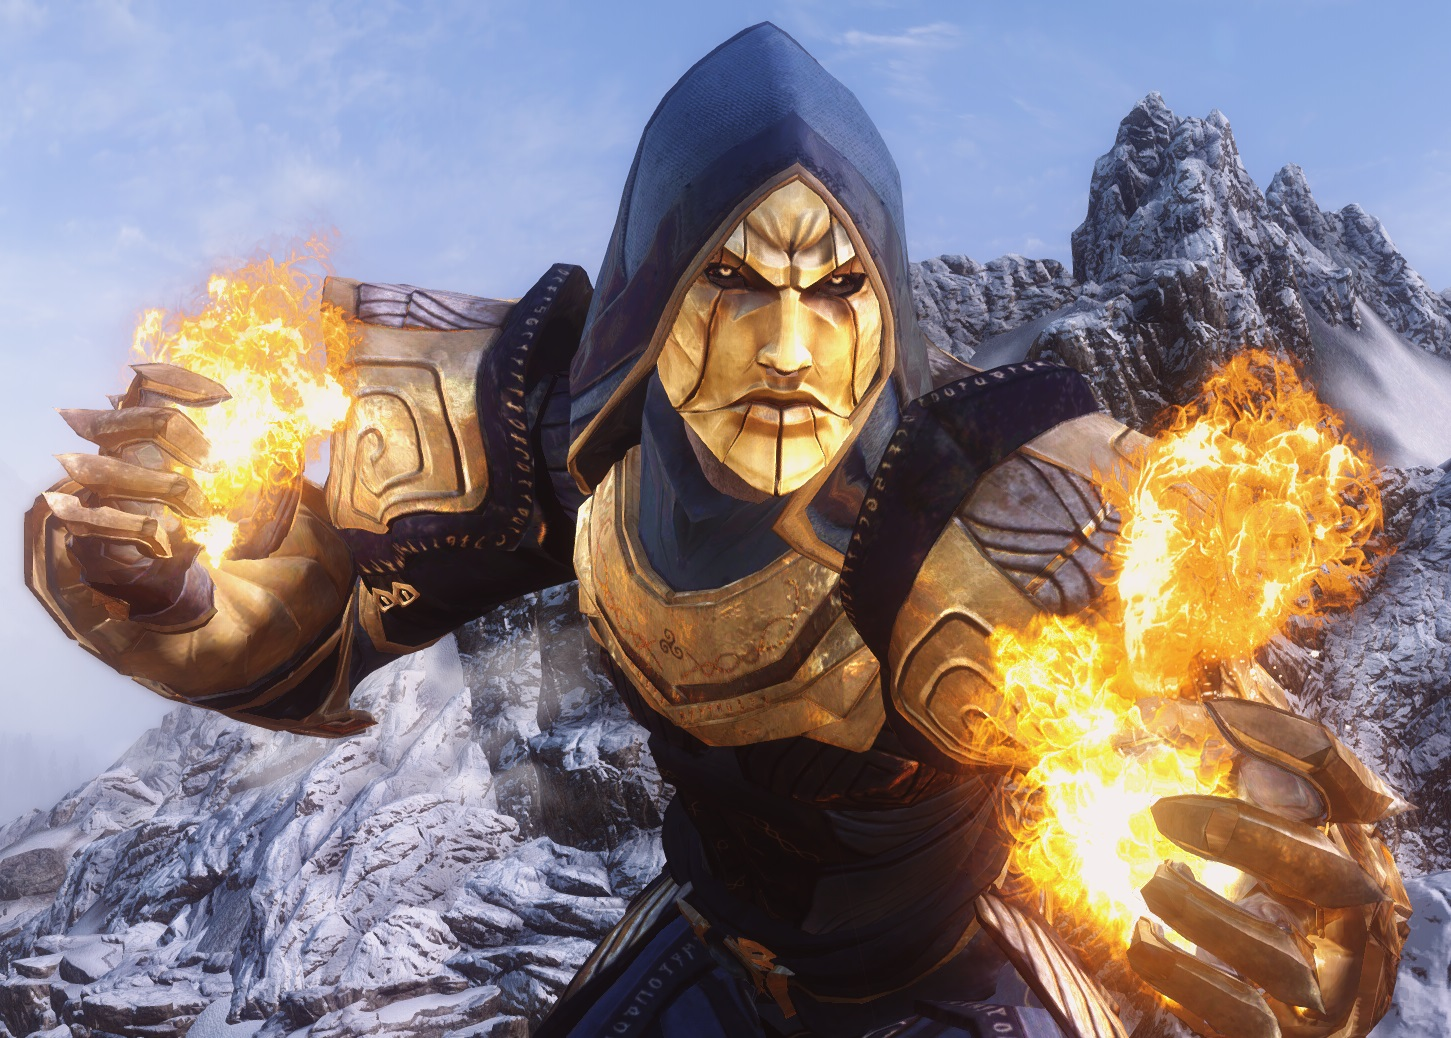 Tribu - Elder Scrolls 5: Skyrim, the